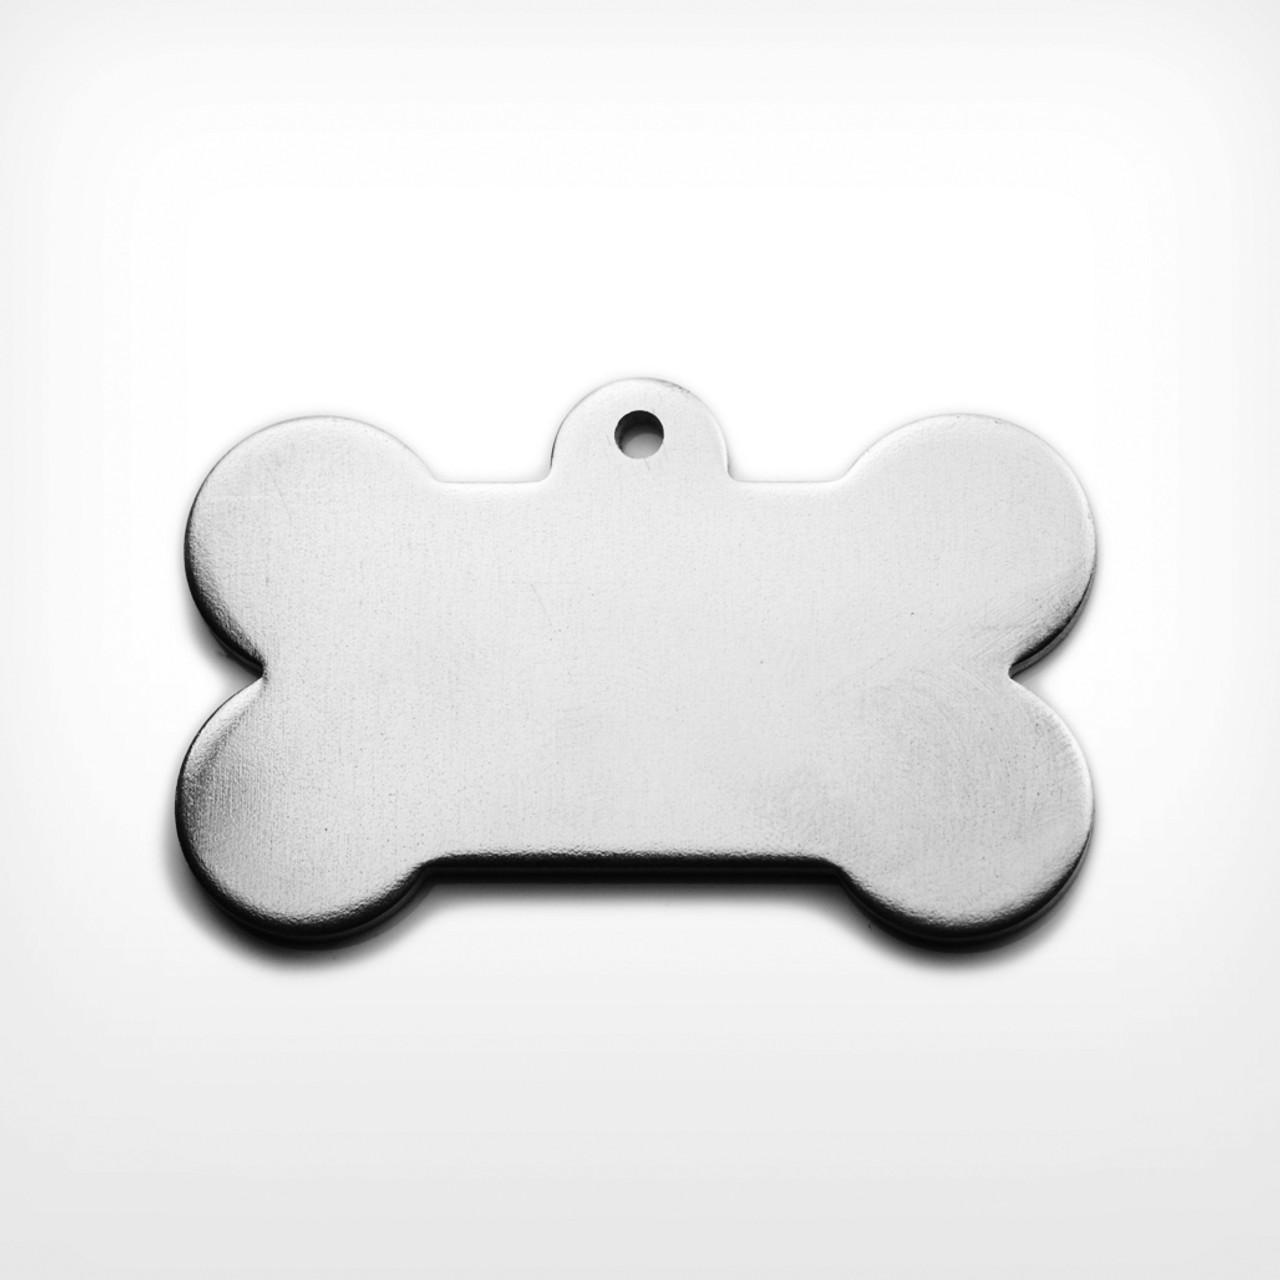 Aluminium Dog Bone, heavy gauge - Pack of 10 (490-AL)